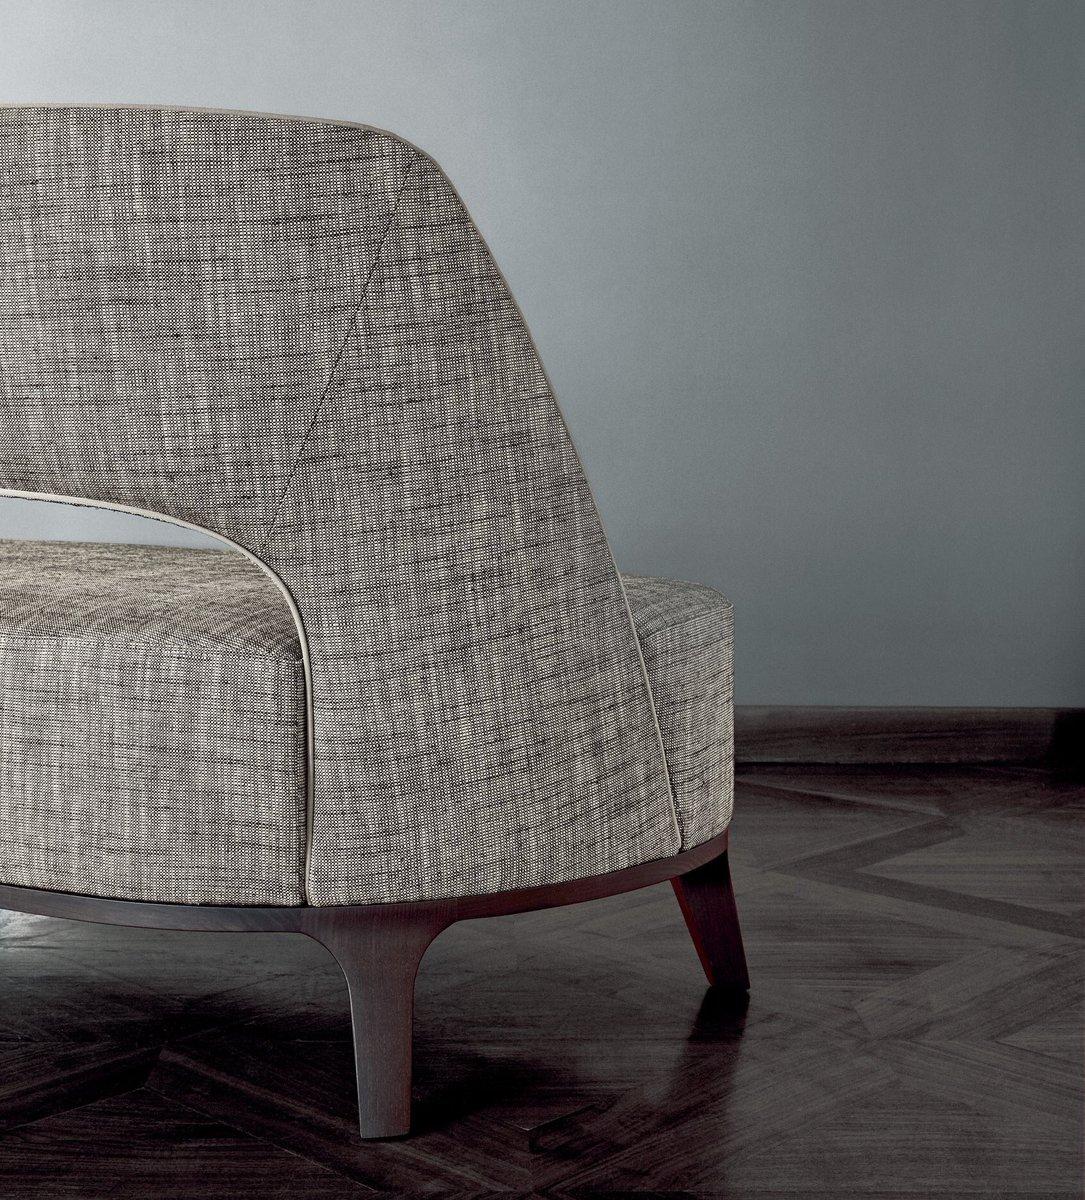 Roberto Lazzeroni Design.Flexform Ita On Twitter An Intimate Look Into The Flexform